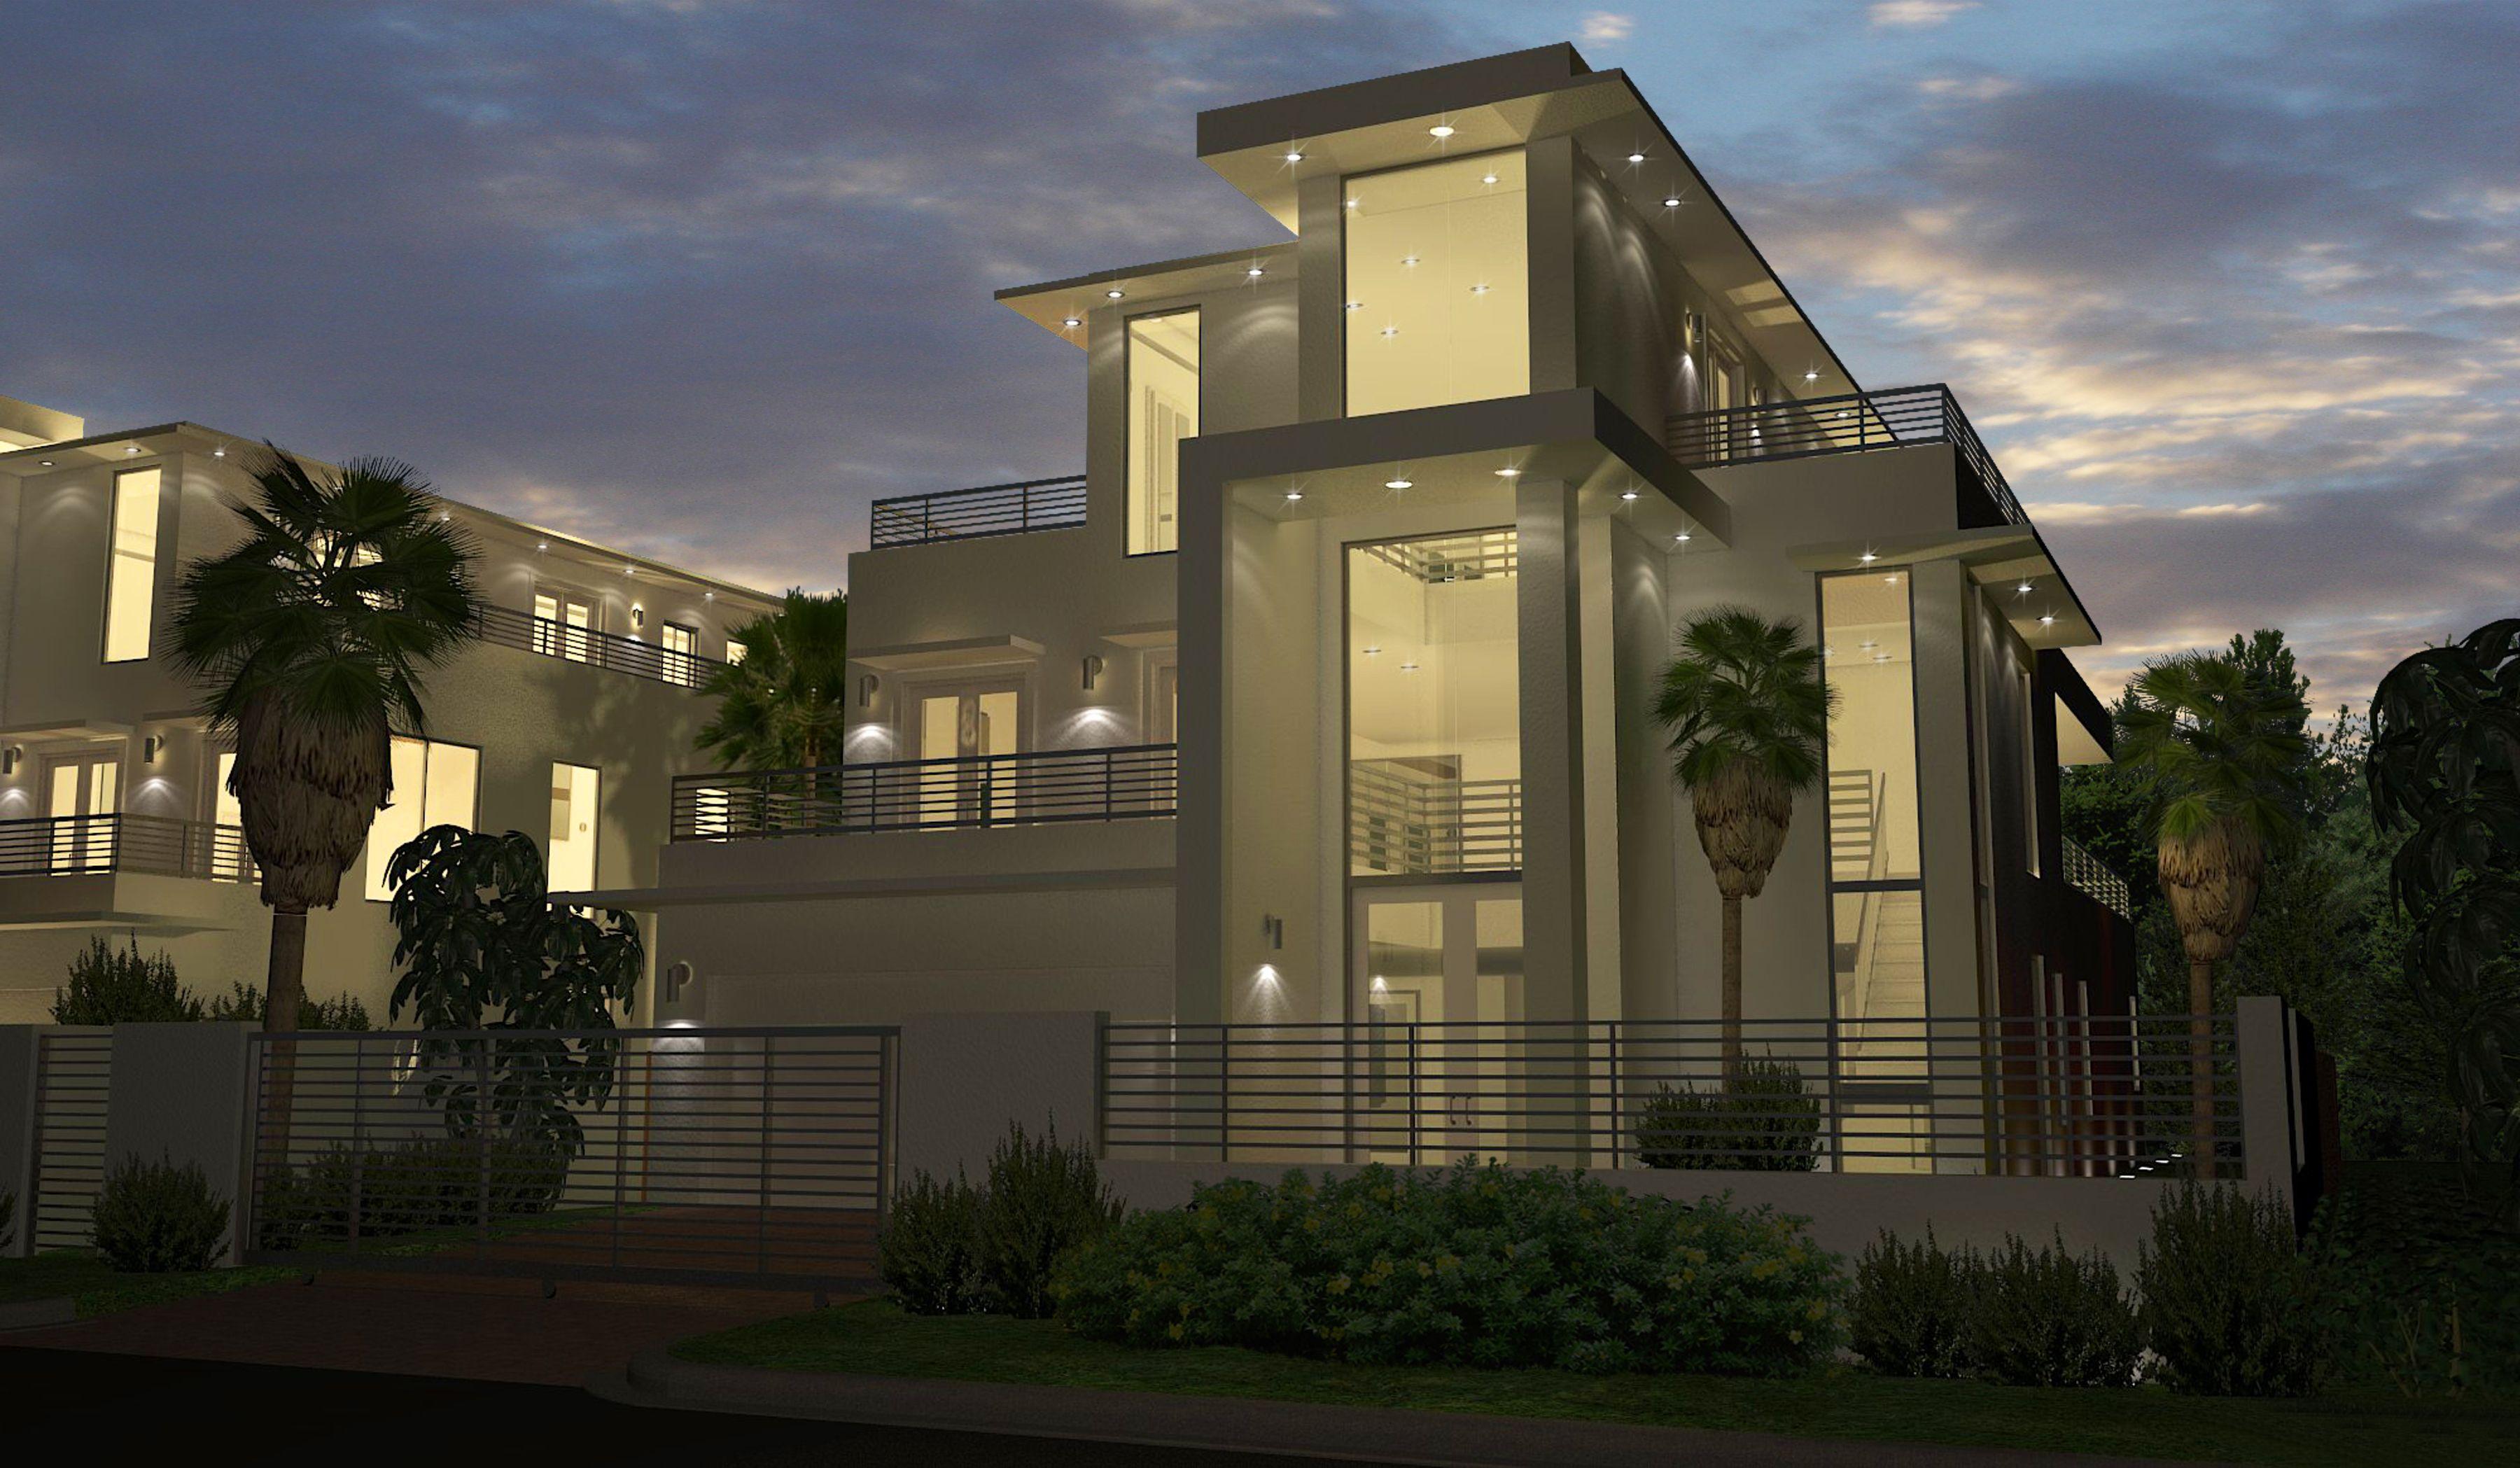 Luxury Homes For Sale Luxury Real Estate Luxury Portfolio Luxury Real Estate Miami Condo South Beach Condo